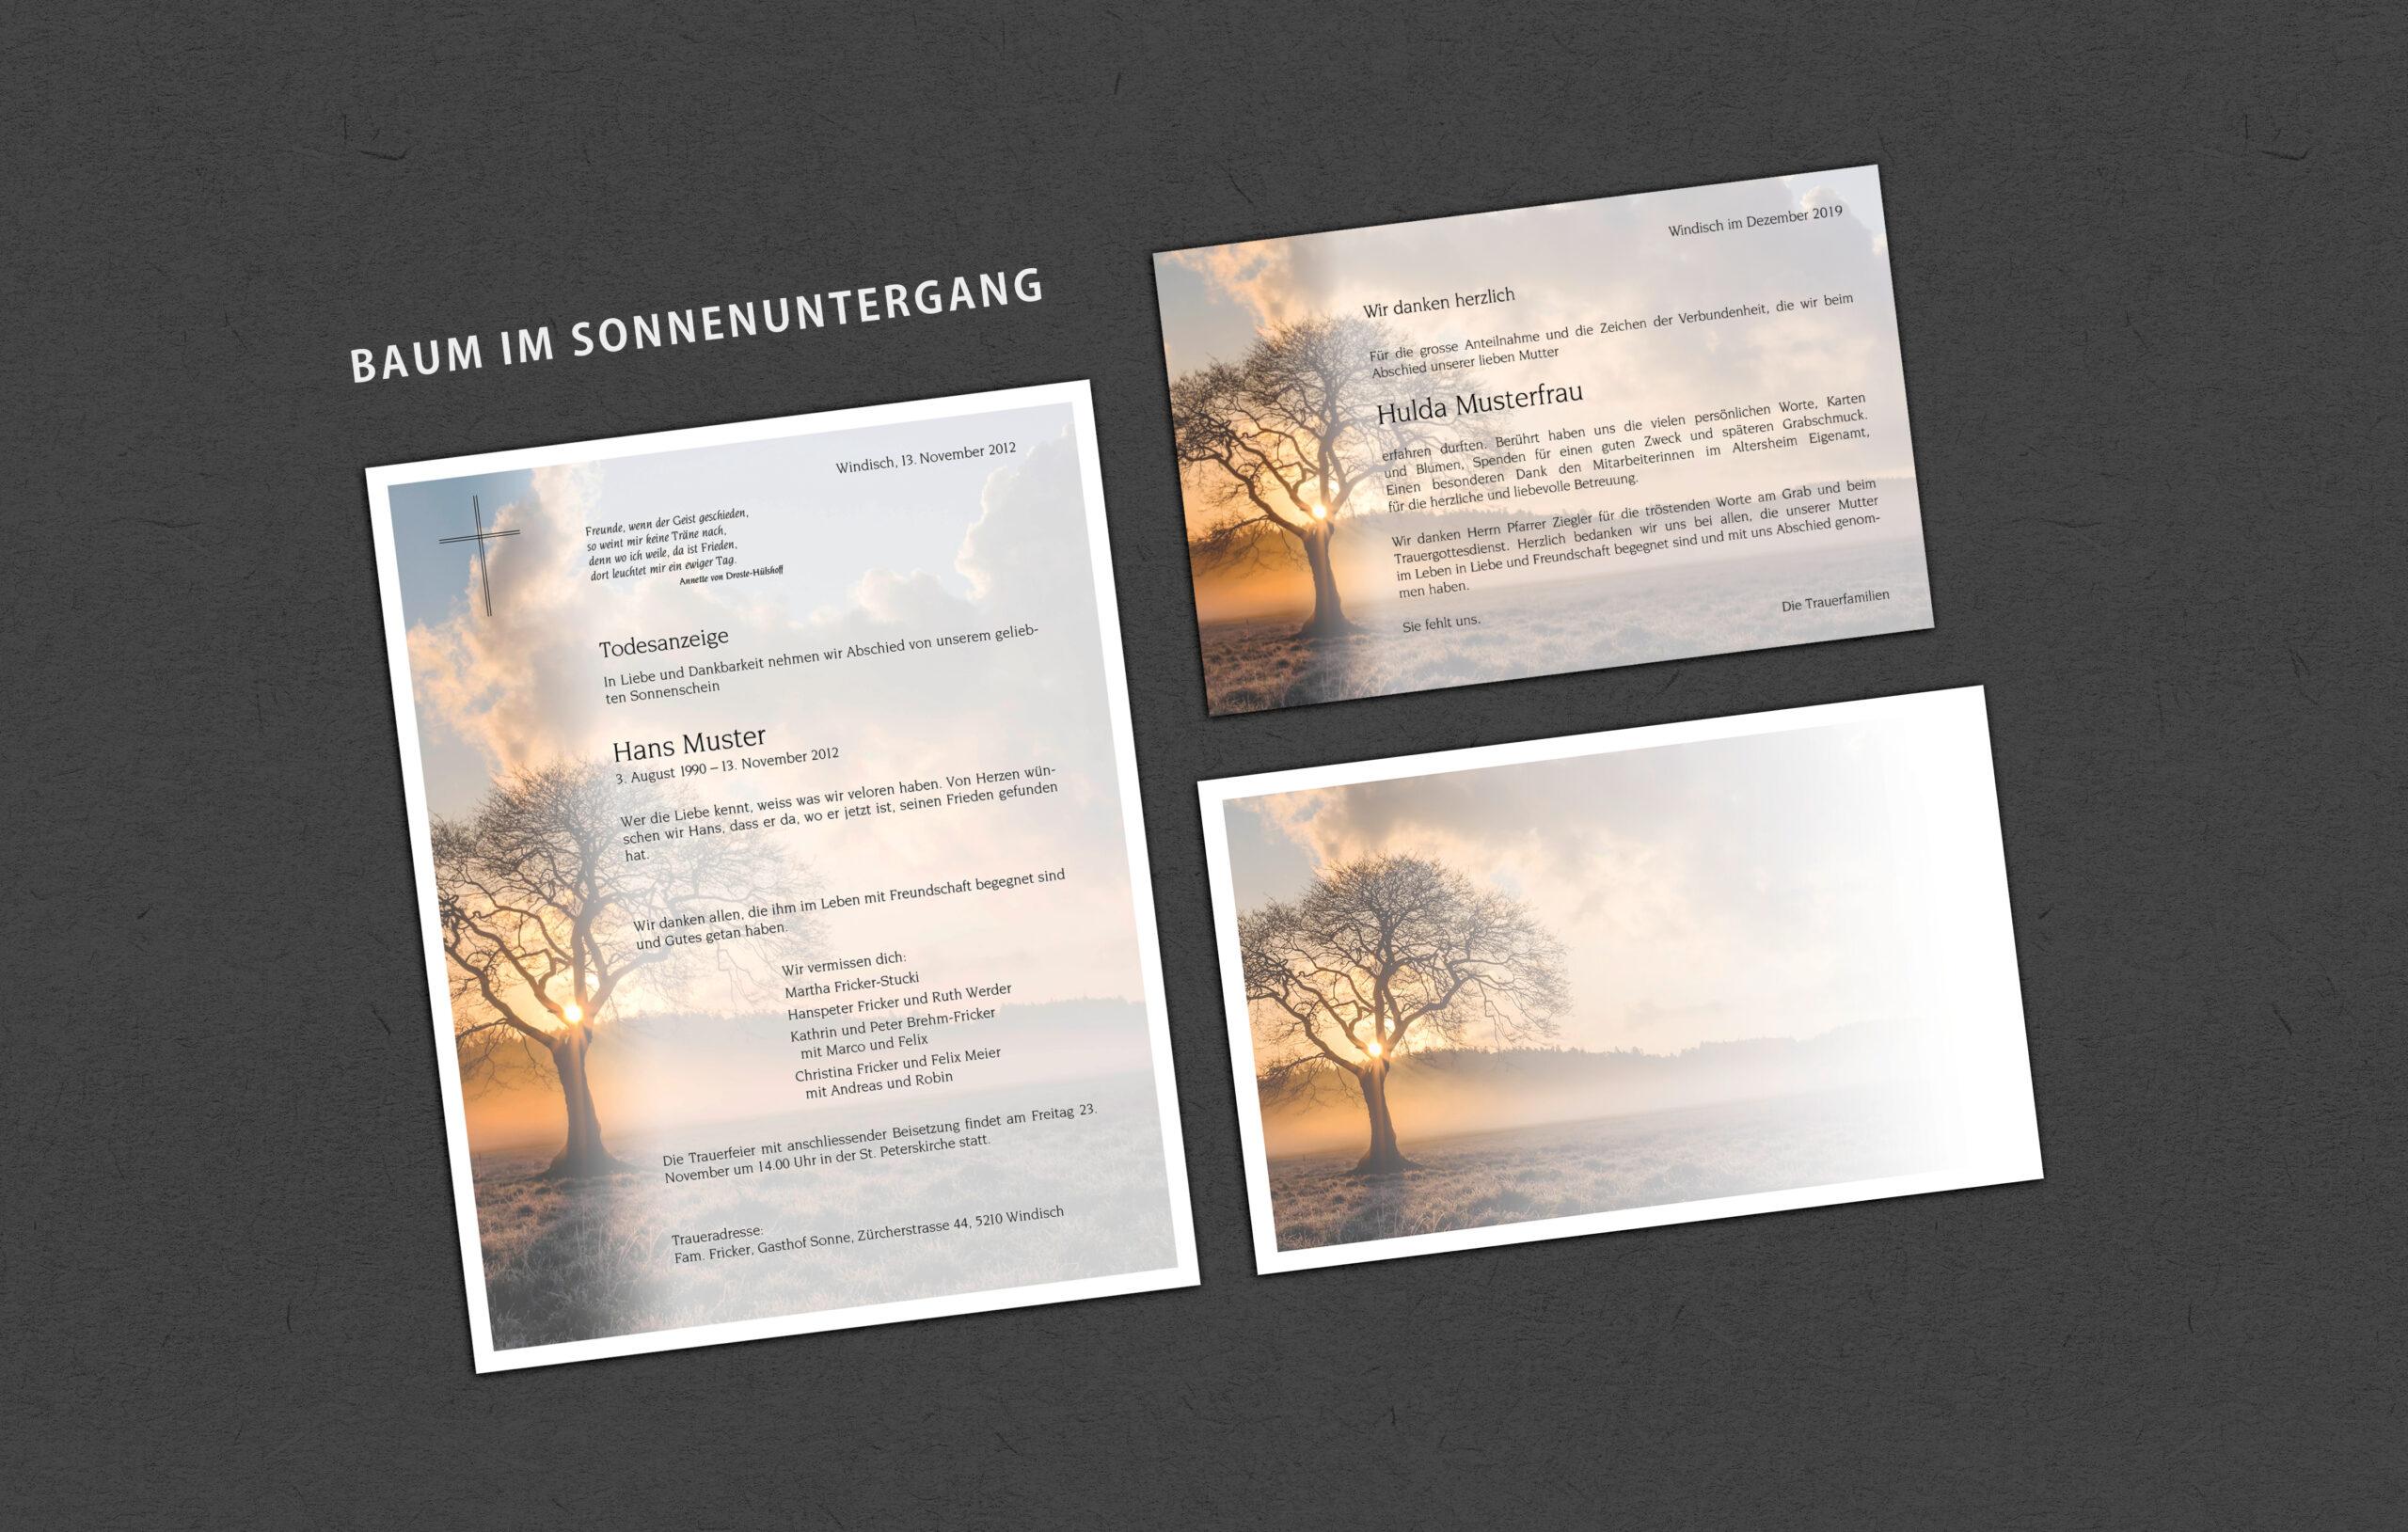 Muster_Sujet Baum im Sonnenuntergang